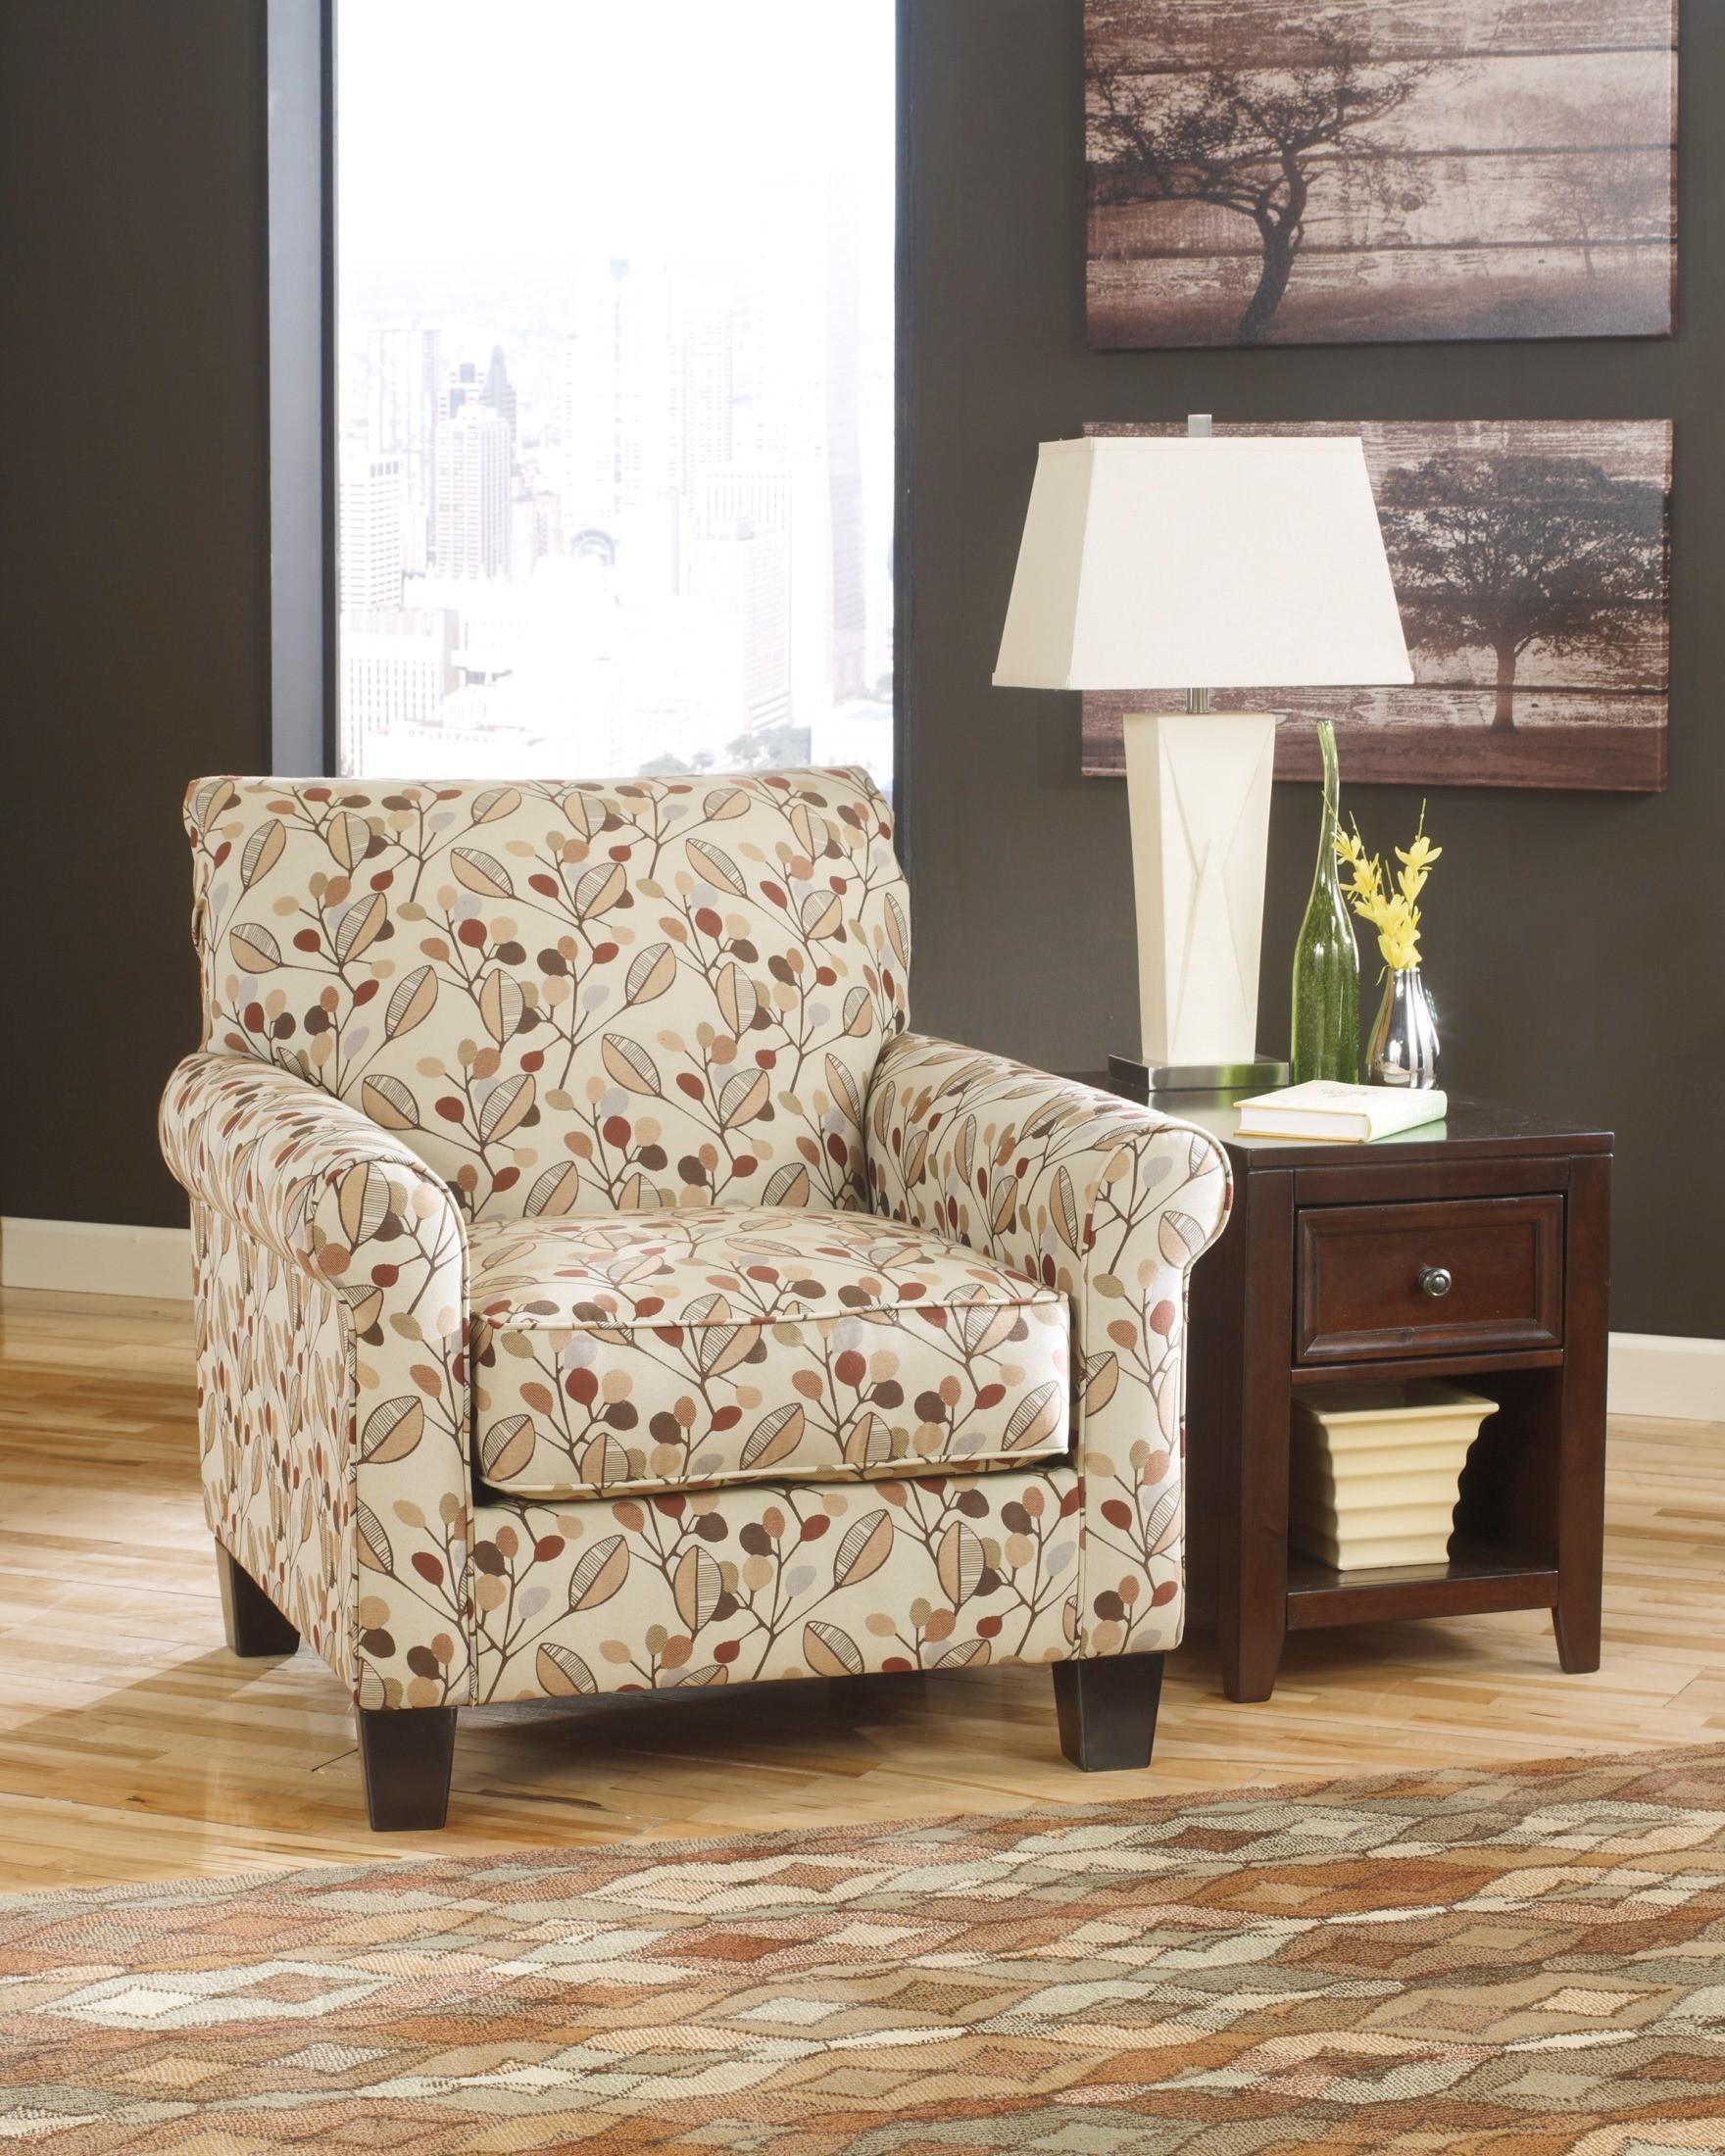 Danely Dusk Living Room Set From Ashley 35500 Coleman